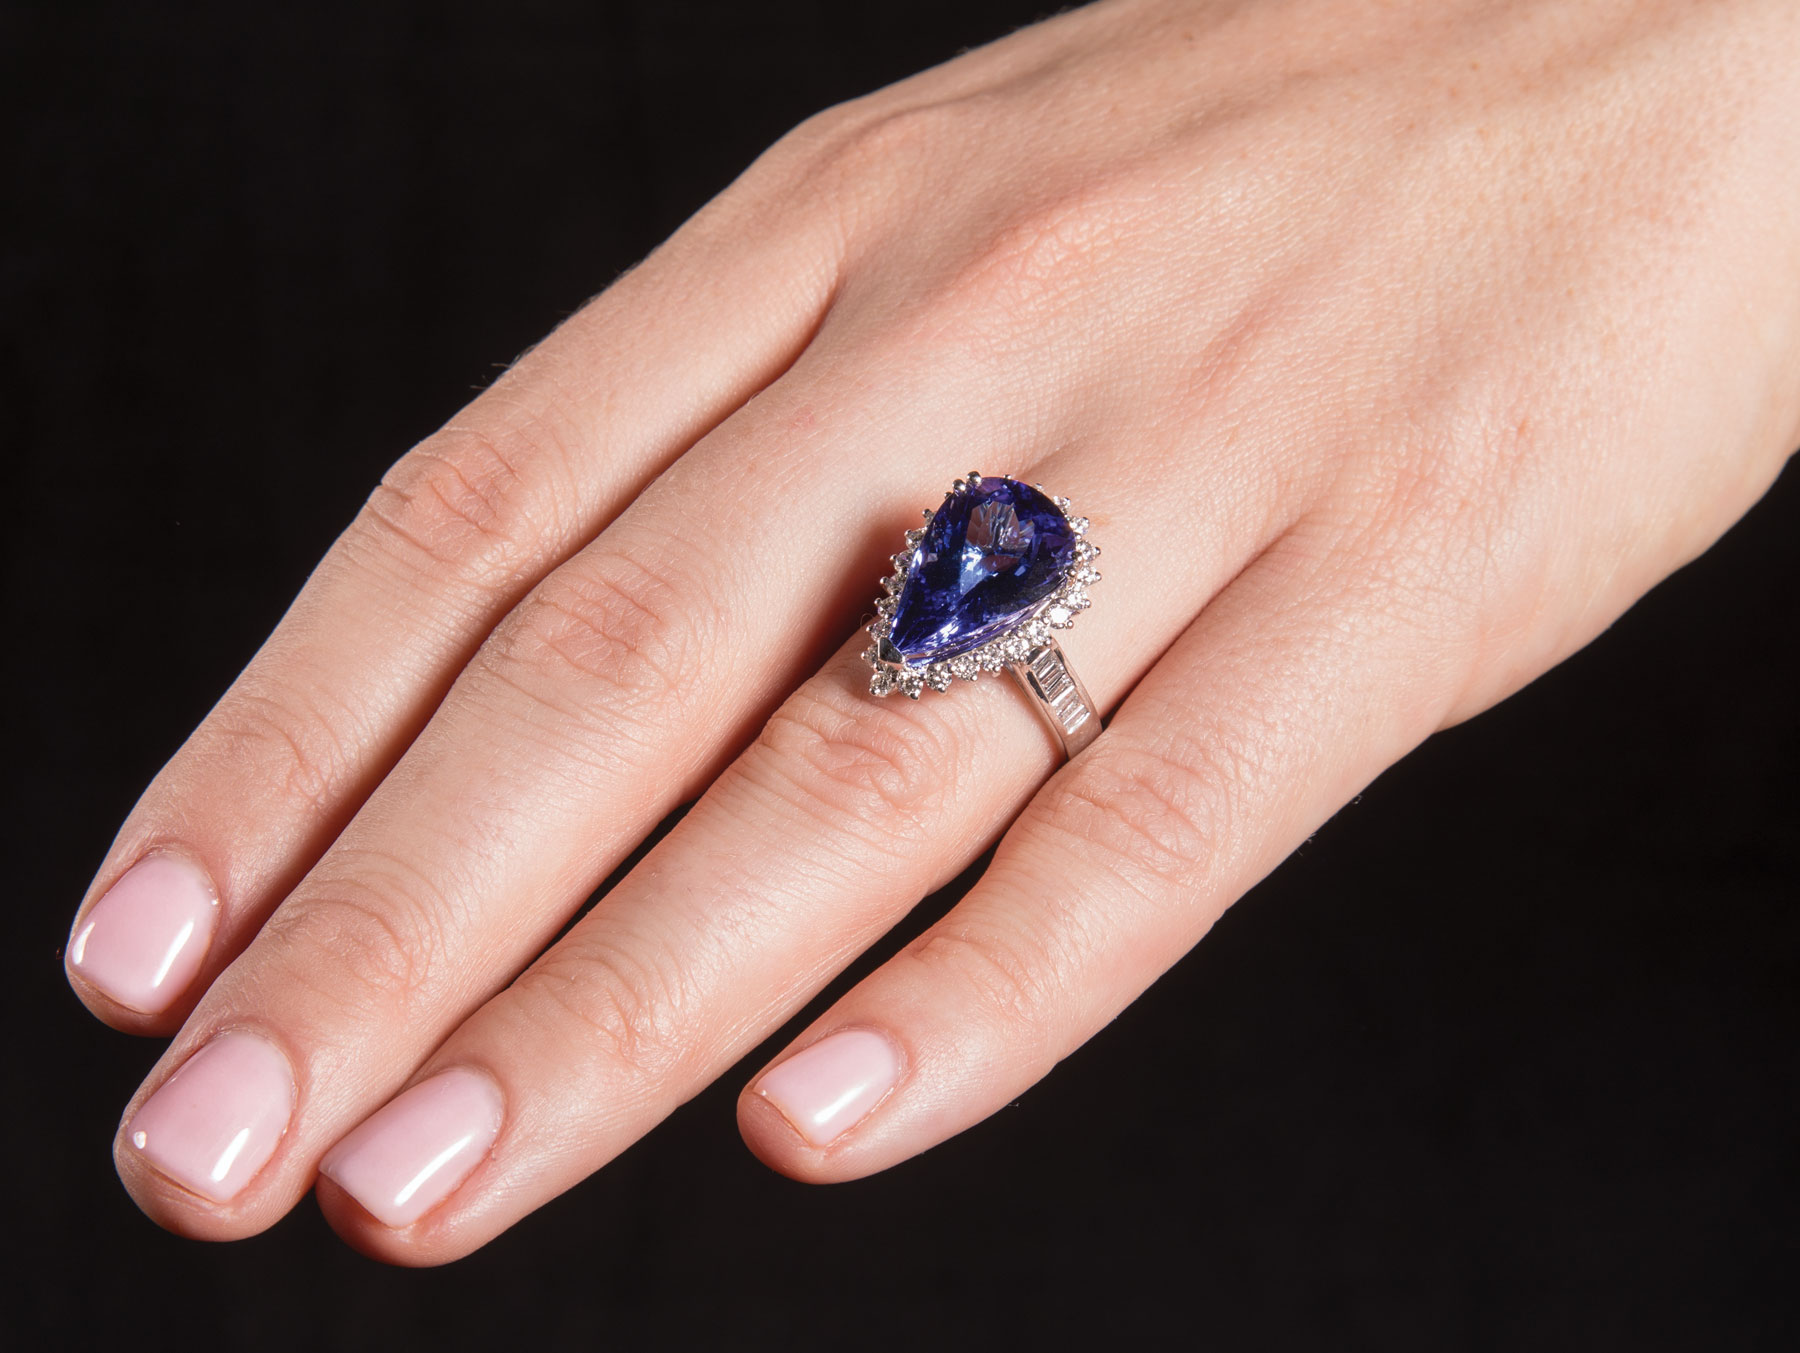 Lot 589 - Platinum, Tanzanite and Diamond Ring , prong set pear shaped modified brilliant cut tanzanite, 17.40